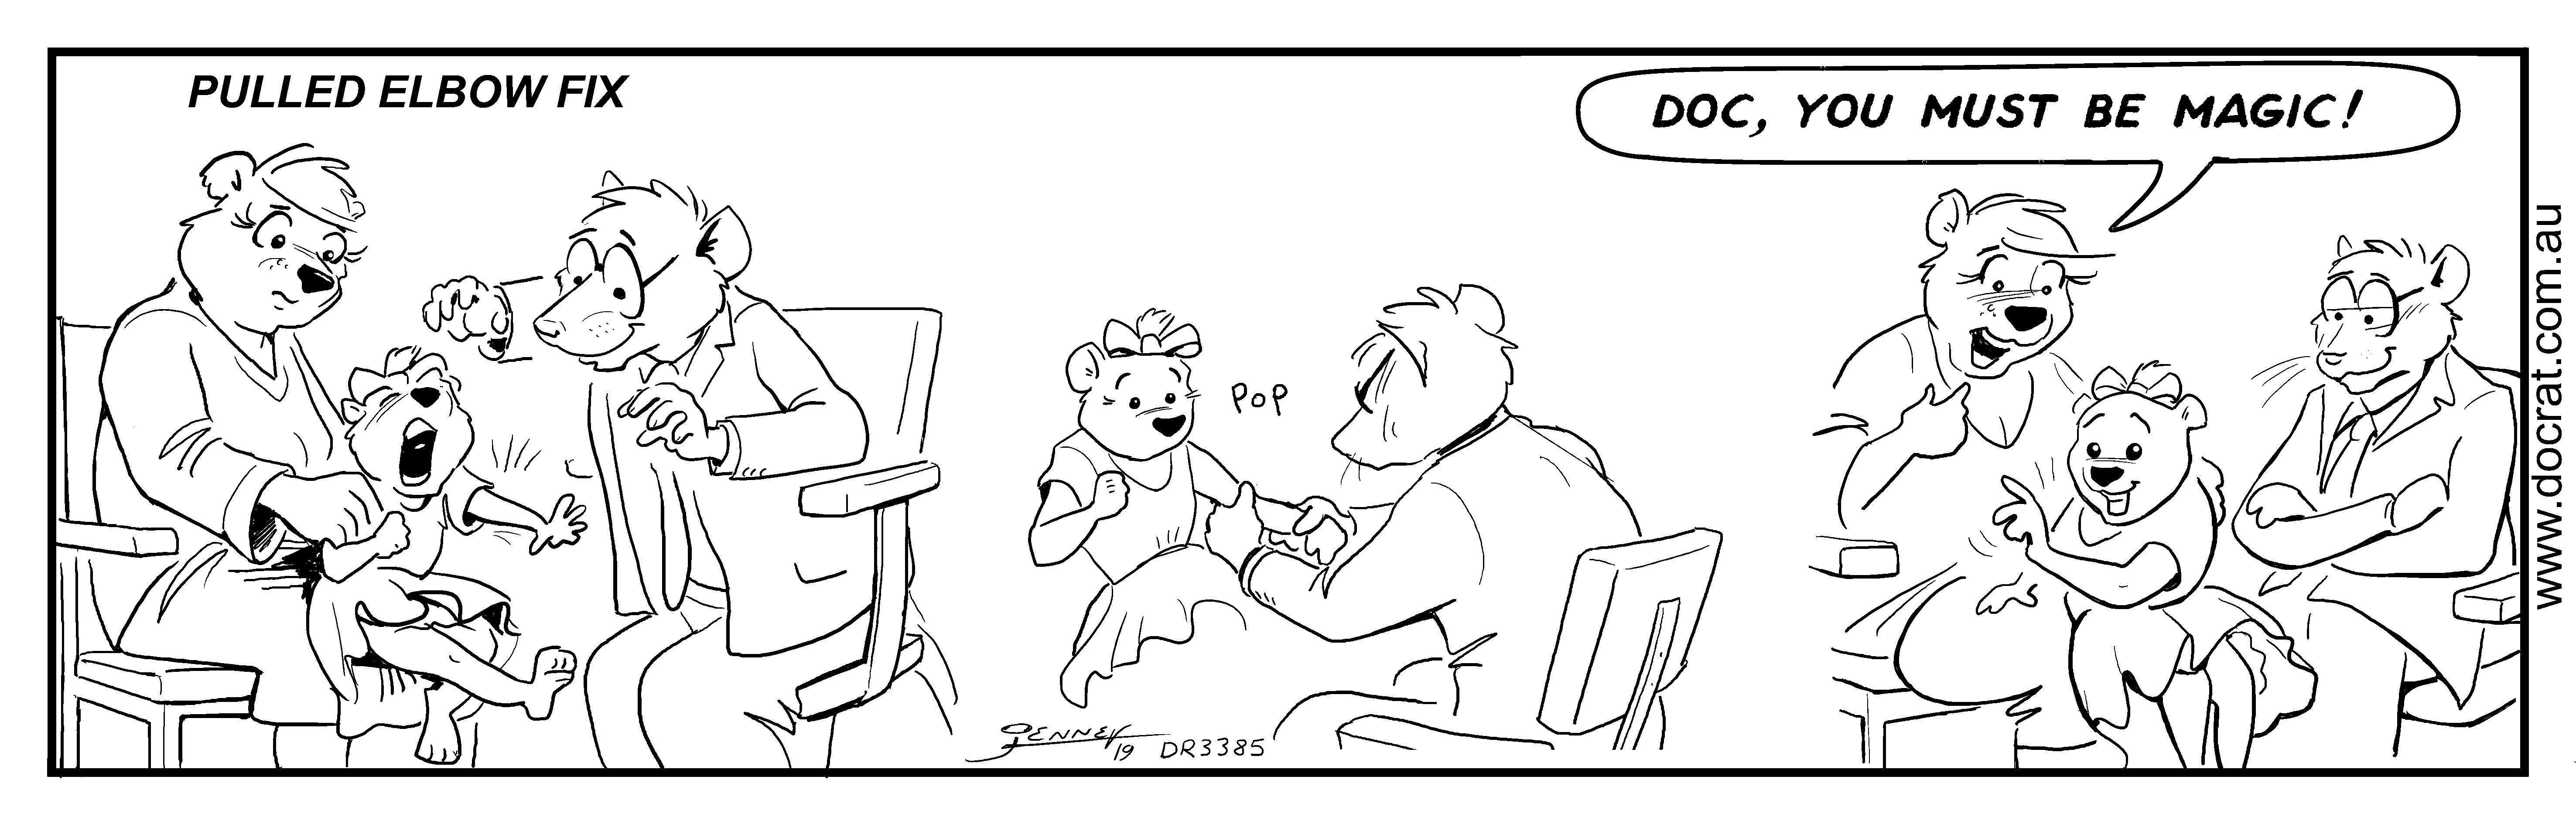 20191213